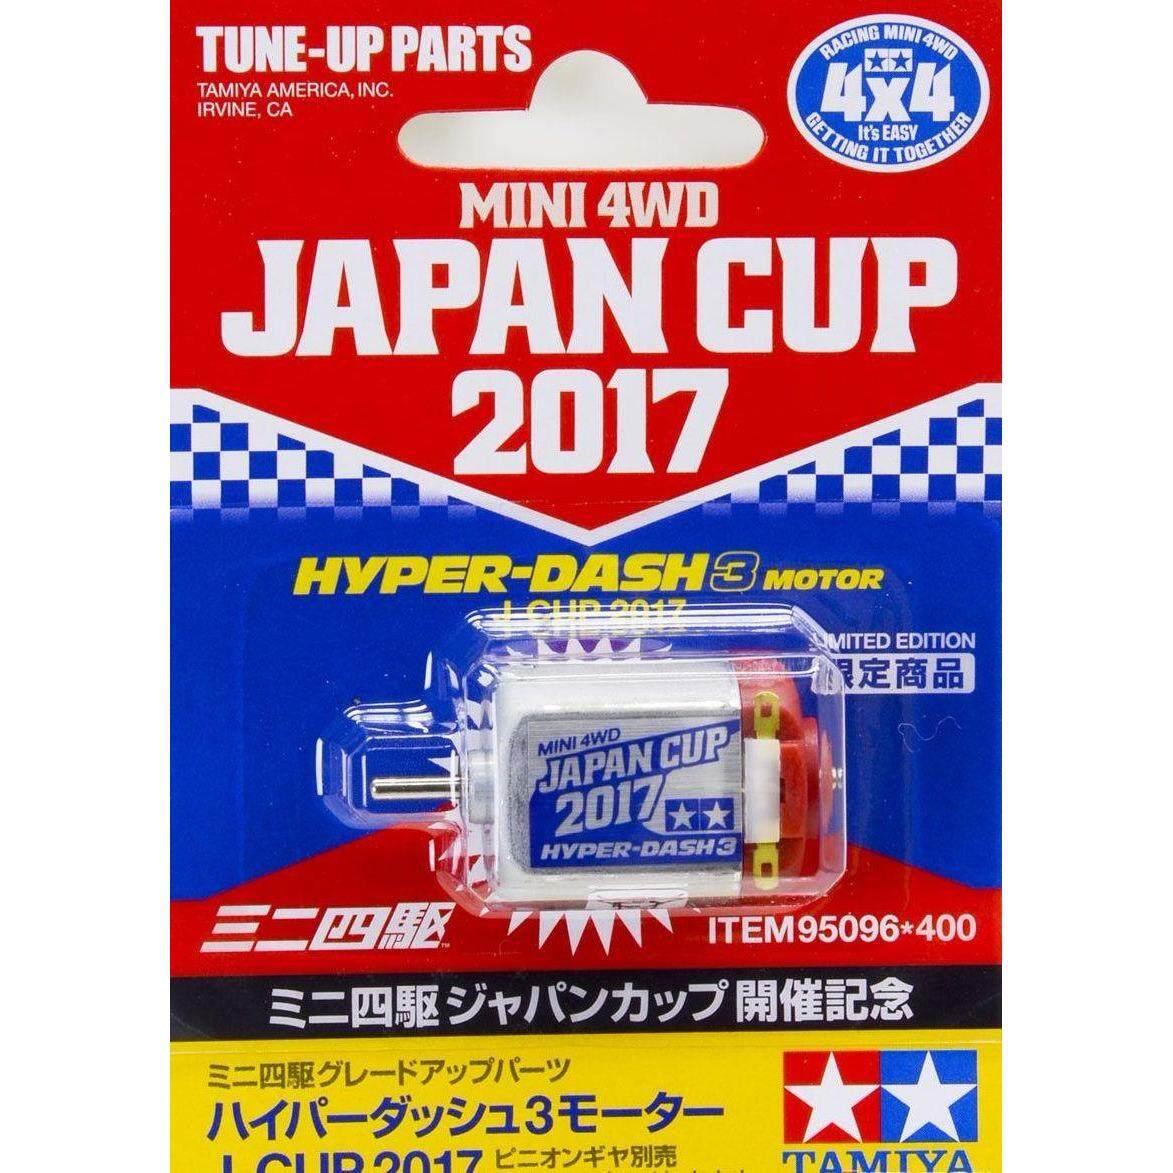 TAMIYA Hyper Dash 3 Motor J-CUP 2017